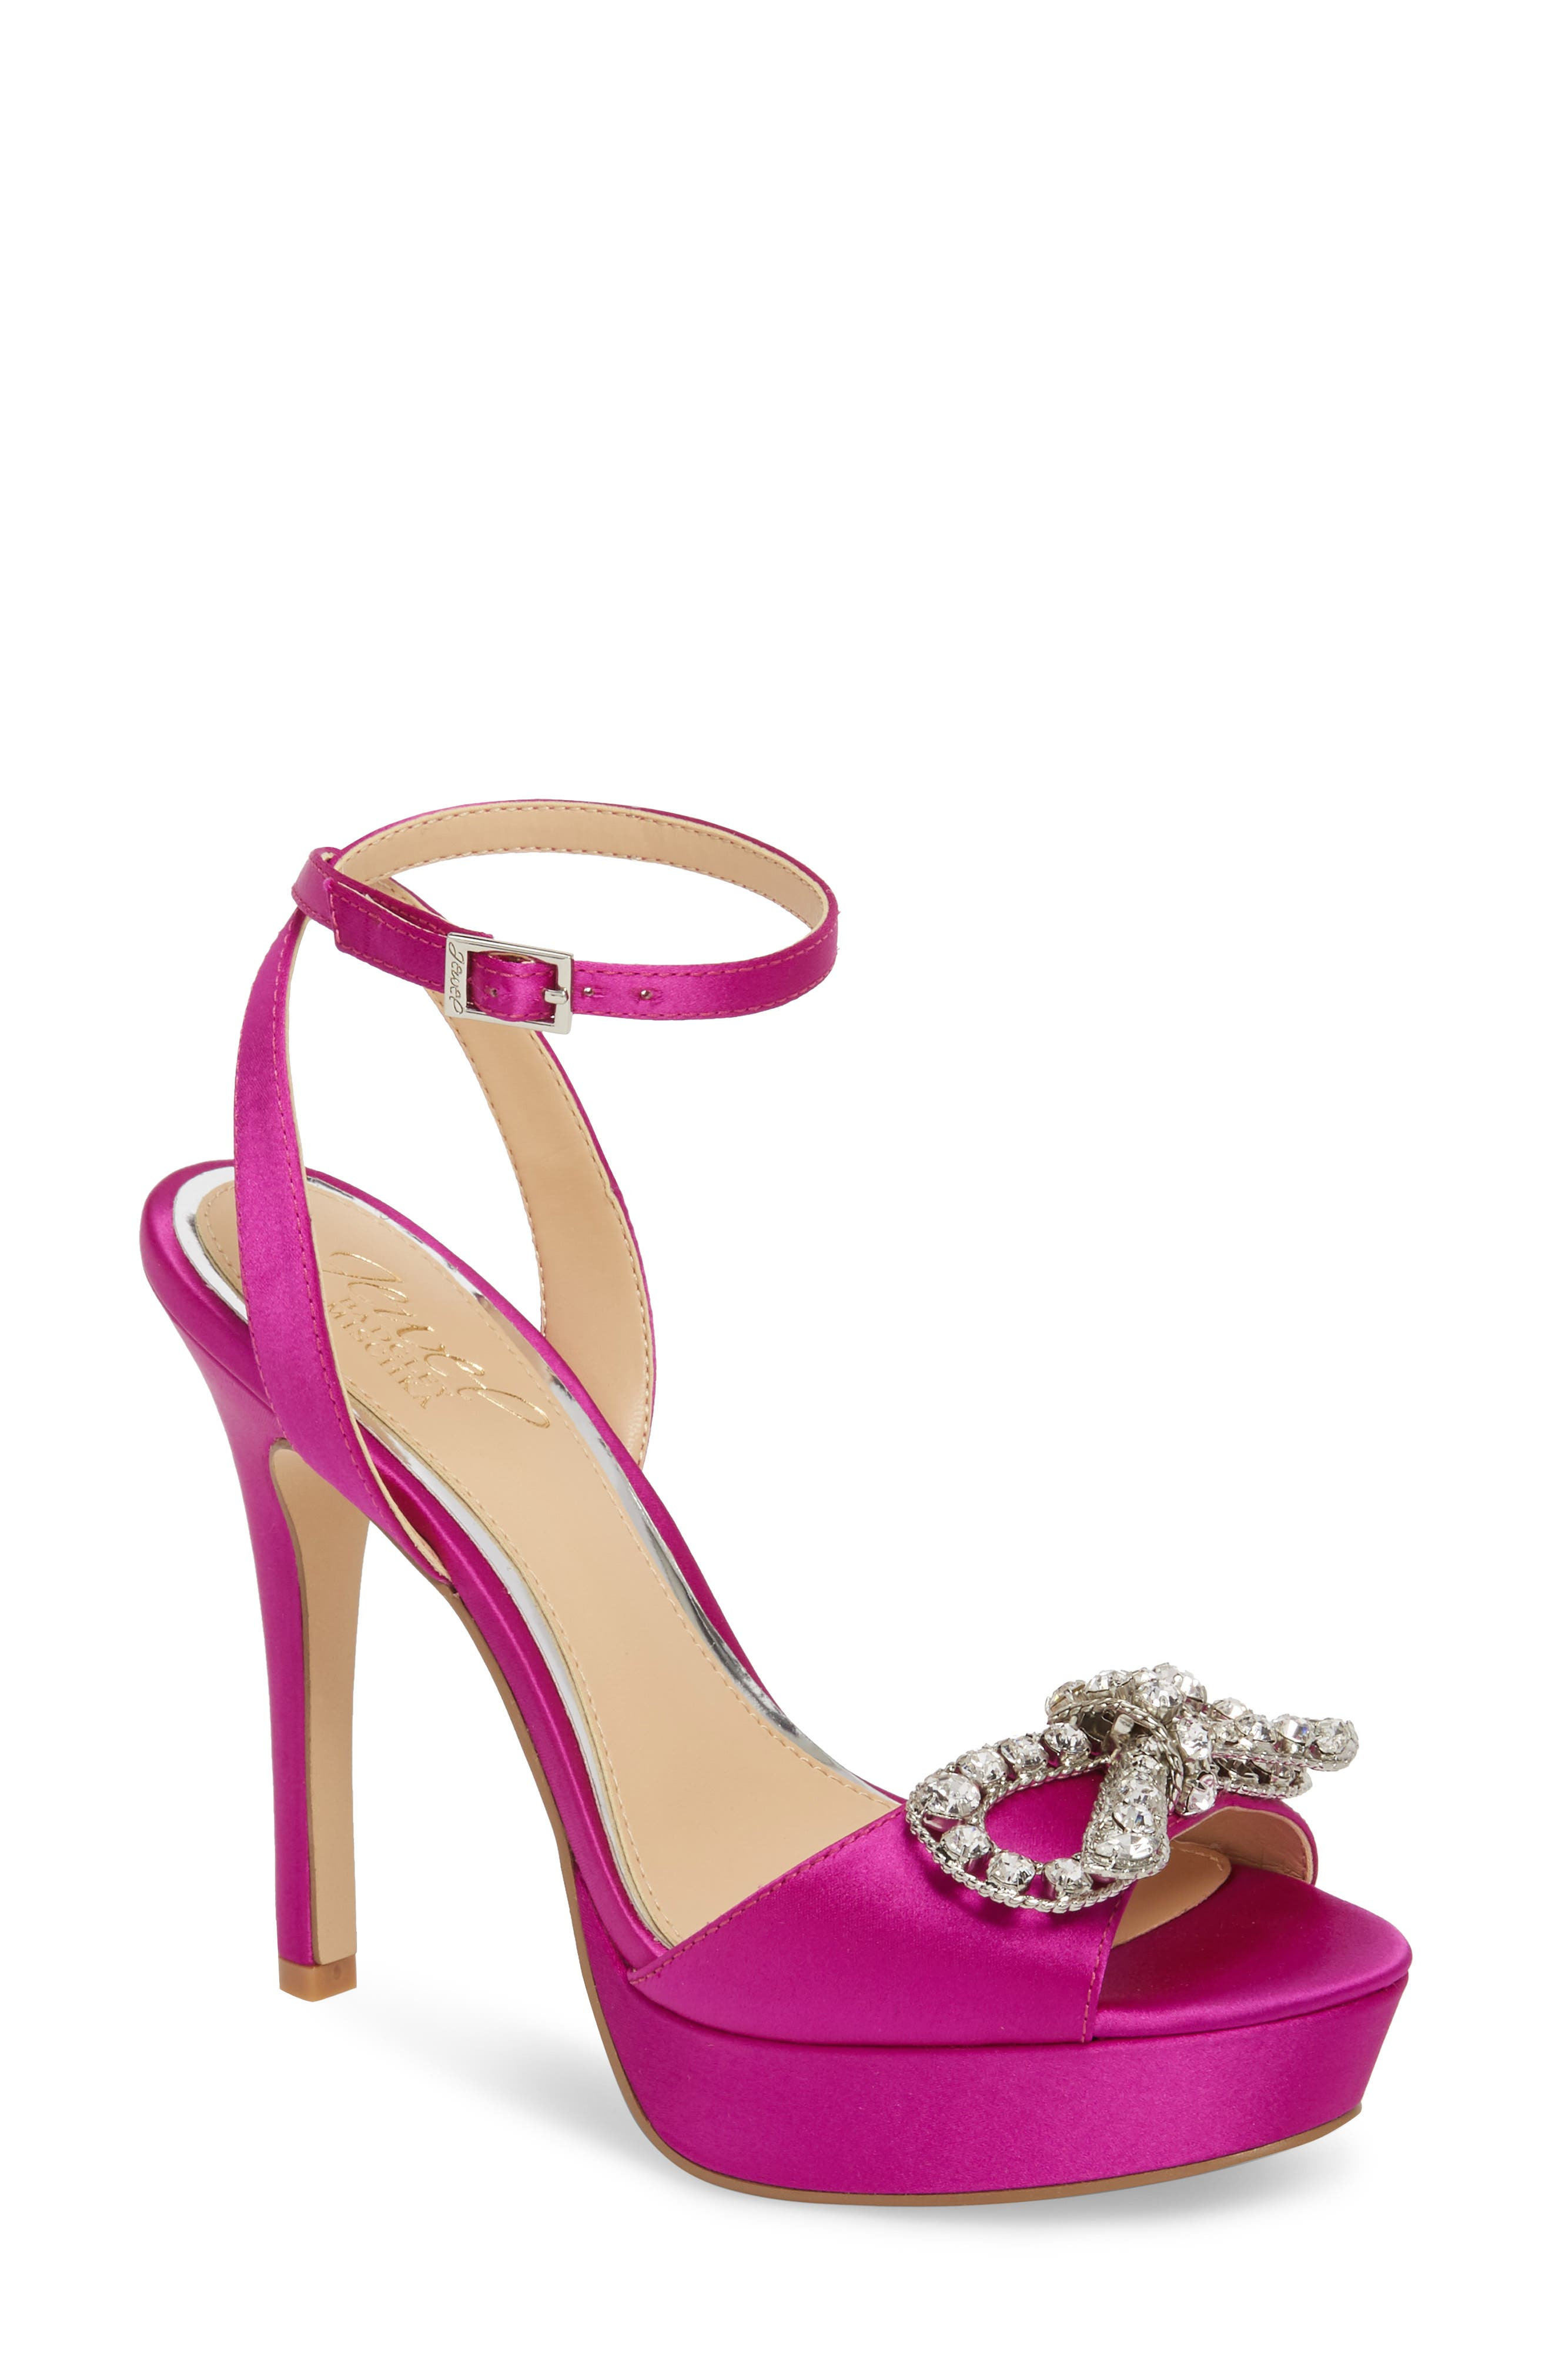 Badgley Mischka Women's Mildred Crystal Bow Platform Sandal kz0XsQA